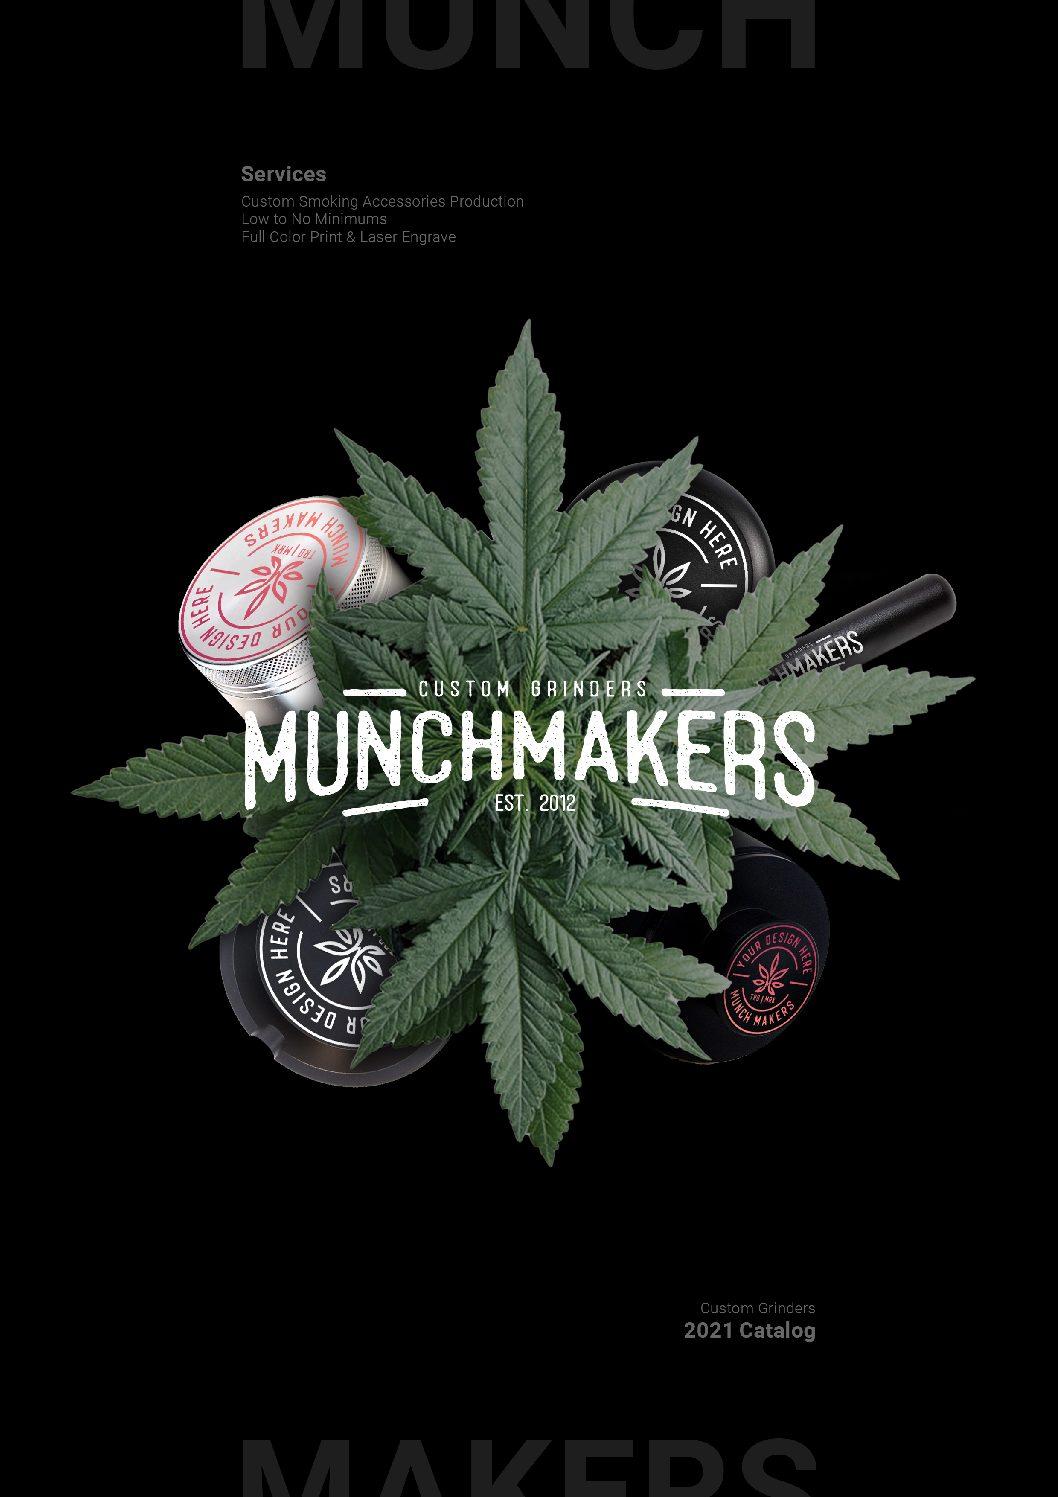 MunchMakers – Best Custom Grinders for Wholesale and Dispensaries